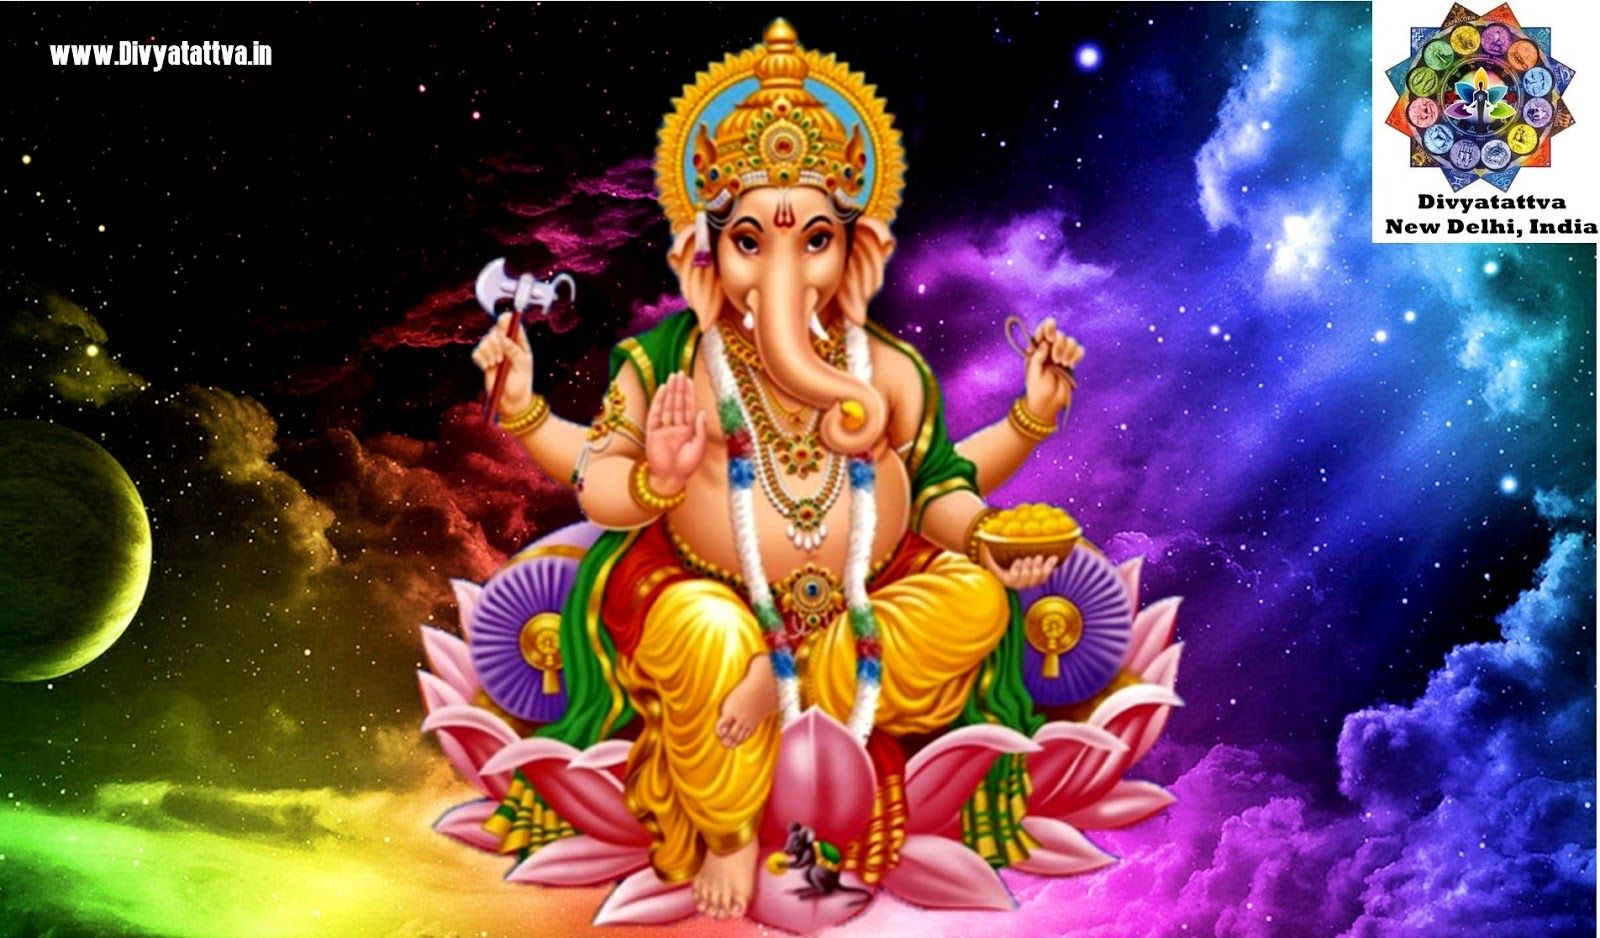 Download Ganesh Images Photos Ganesh Images Full Hd Ganesh High Resolution Lord Vinayagar For Desktop Or Mobile Devic Ganesh Images Ganesh Wallpaper Image